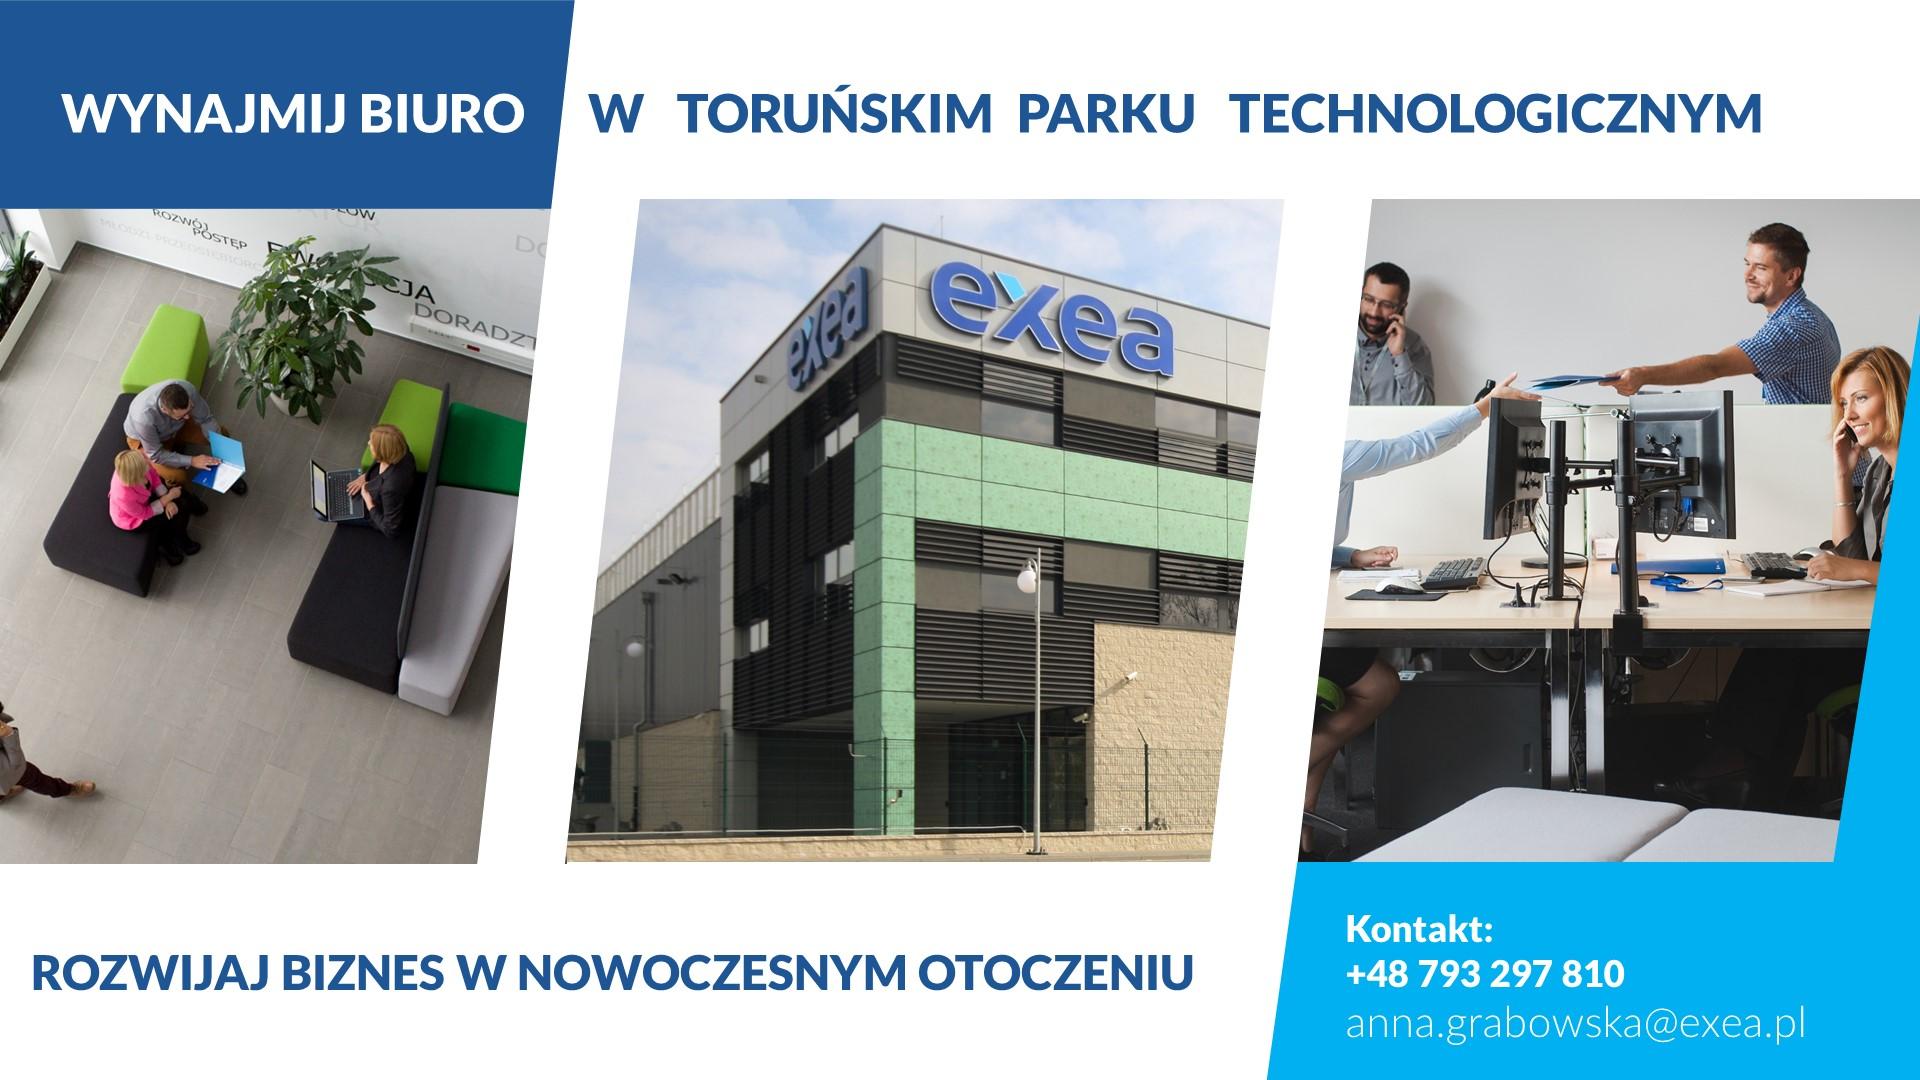 http://www.technopark.org.pl/wp-content/uploads/2016/11/TPT-oferta-powierzchni-biurowej-10.11.2016-1.pdf